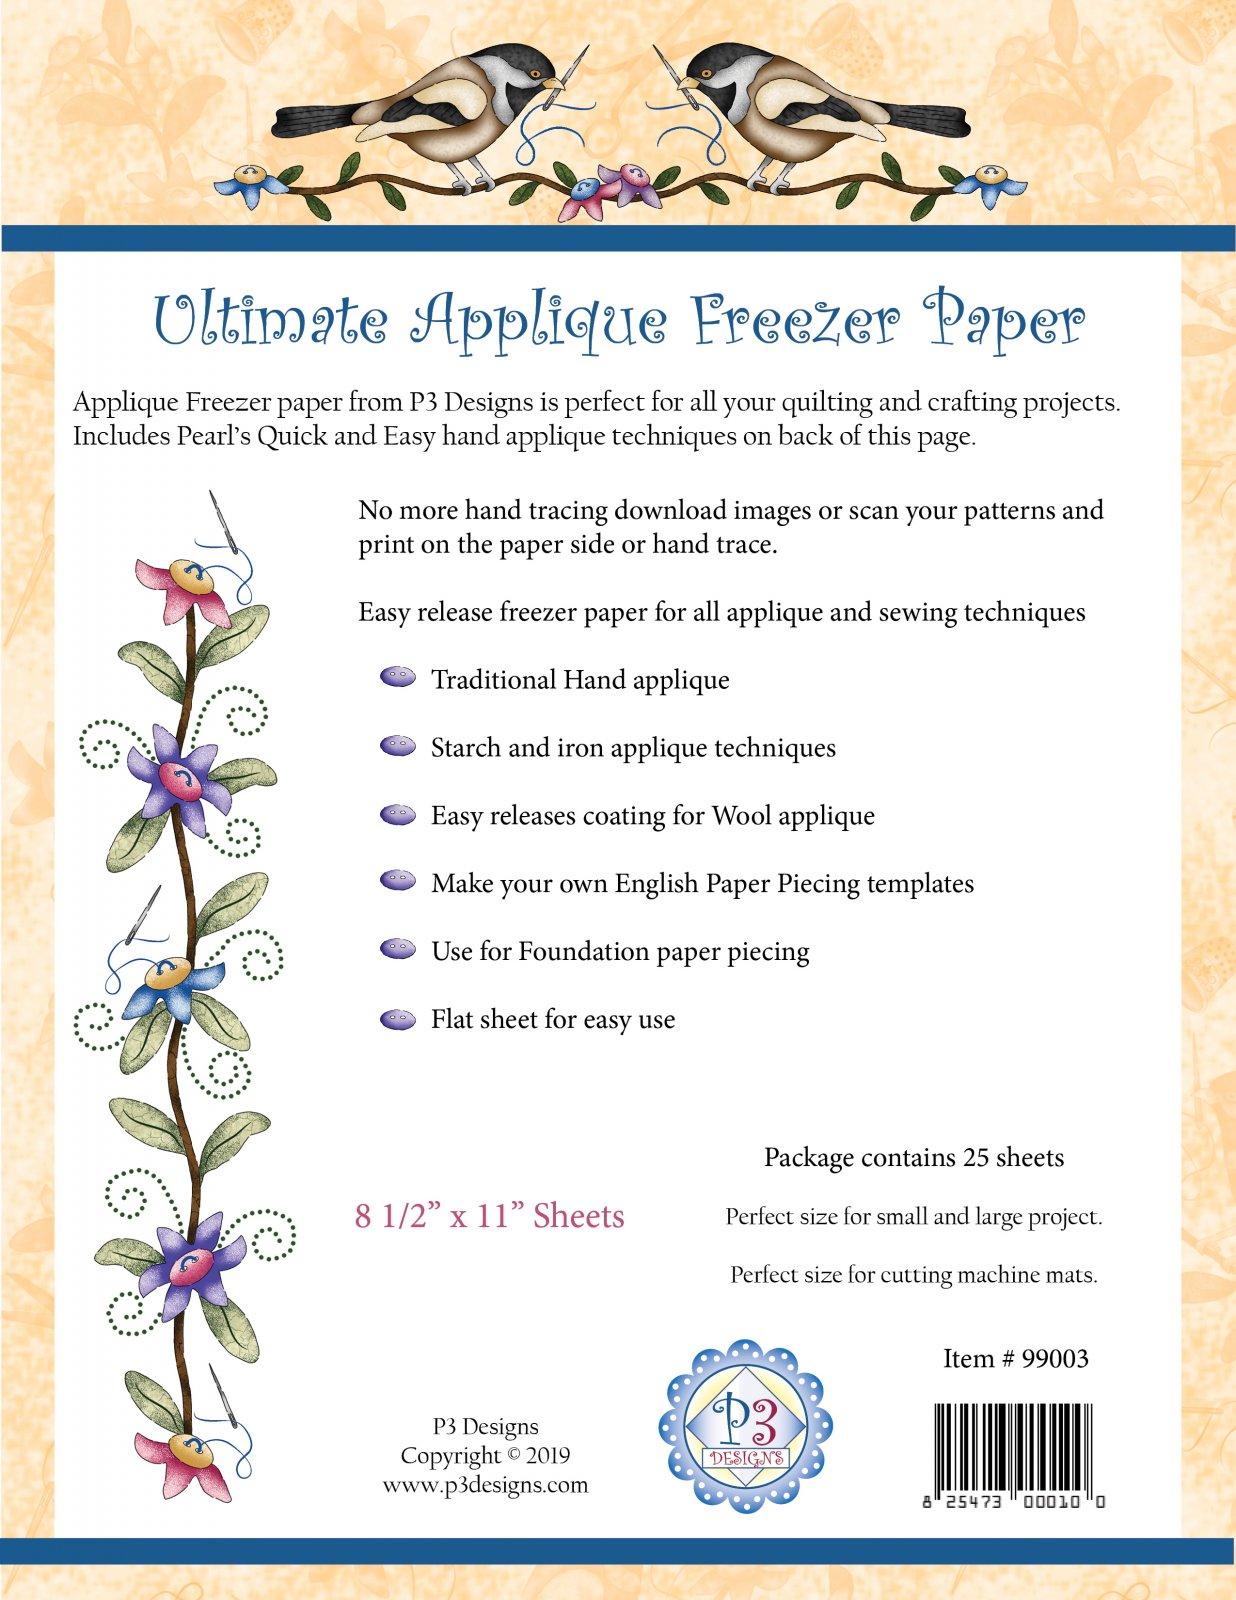 99003 Ultimate Applique Template Paper 8.5 x 11